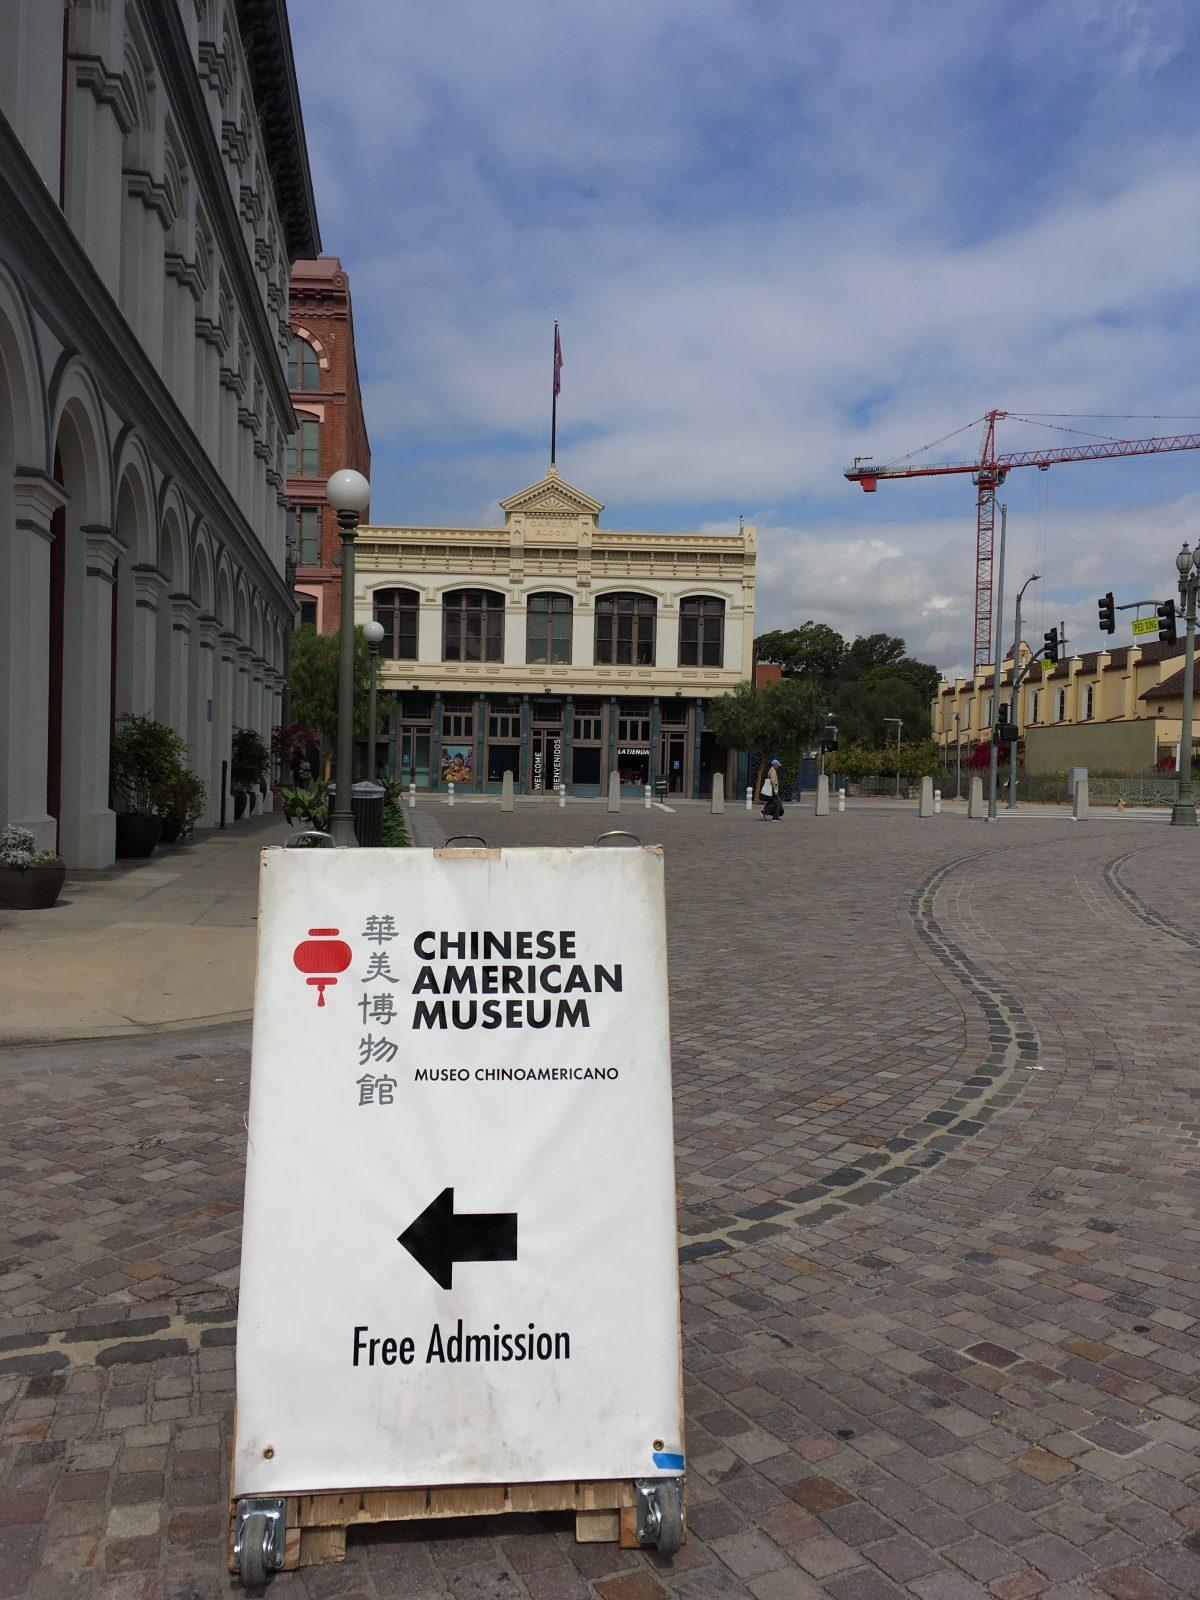 Union Station and Olvera Street